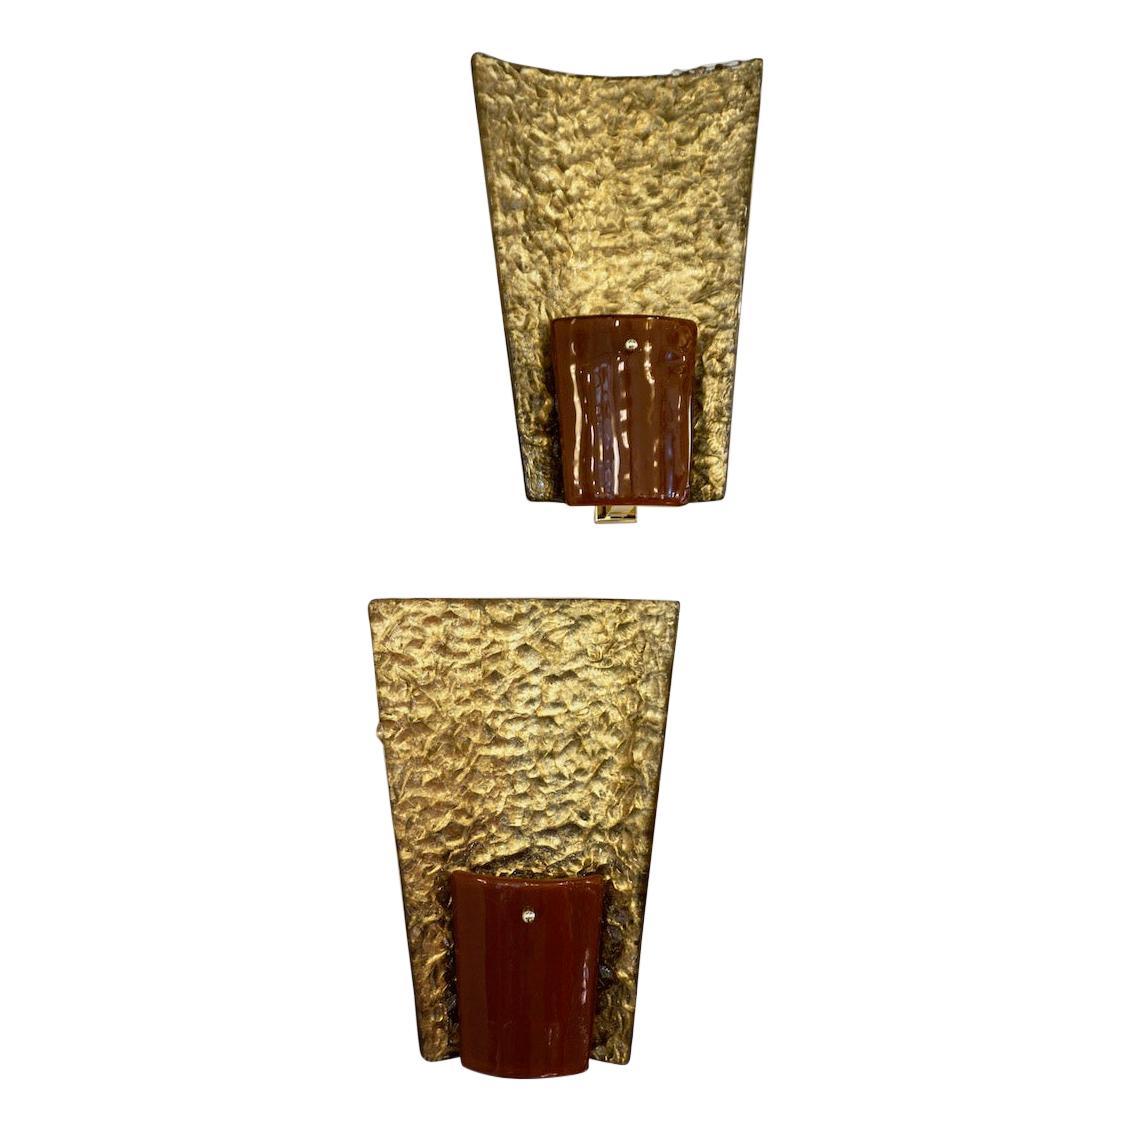 Contemporary Italian Pair of Gold and Amber/Orange Murano Glass Organic Sconces